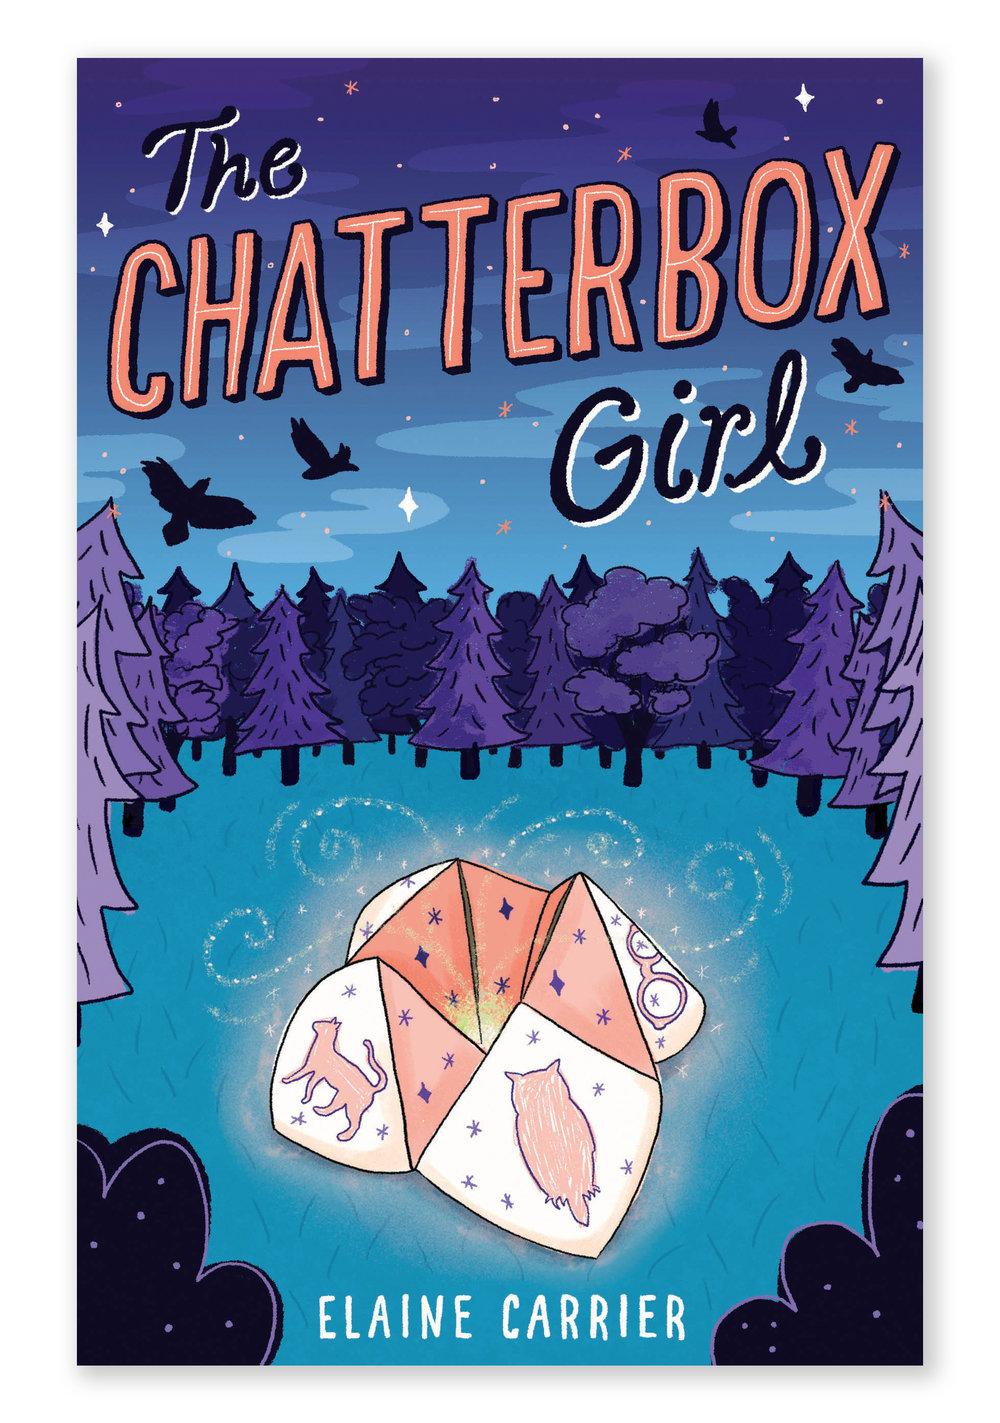 ChatterboxGirl_Cover.jpg